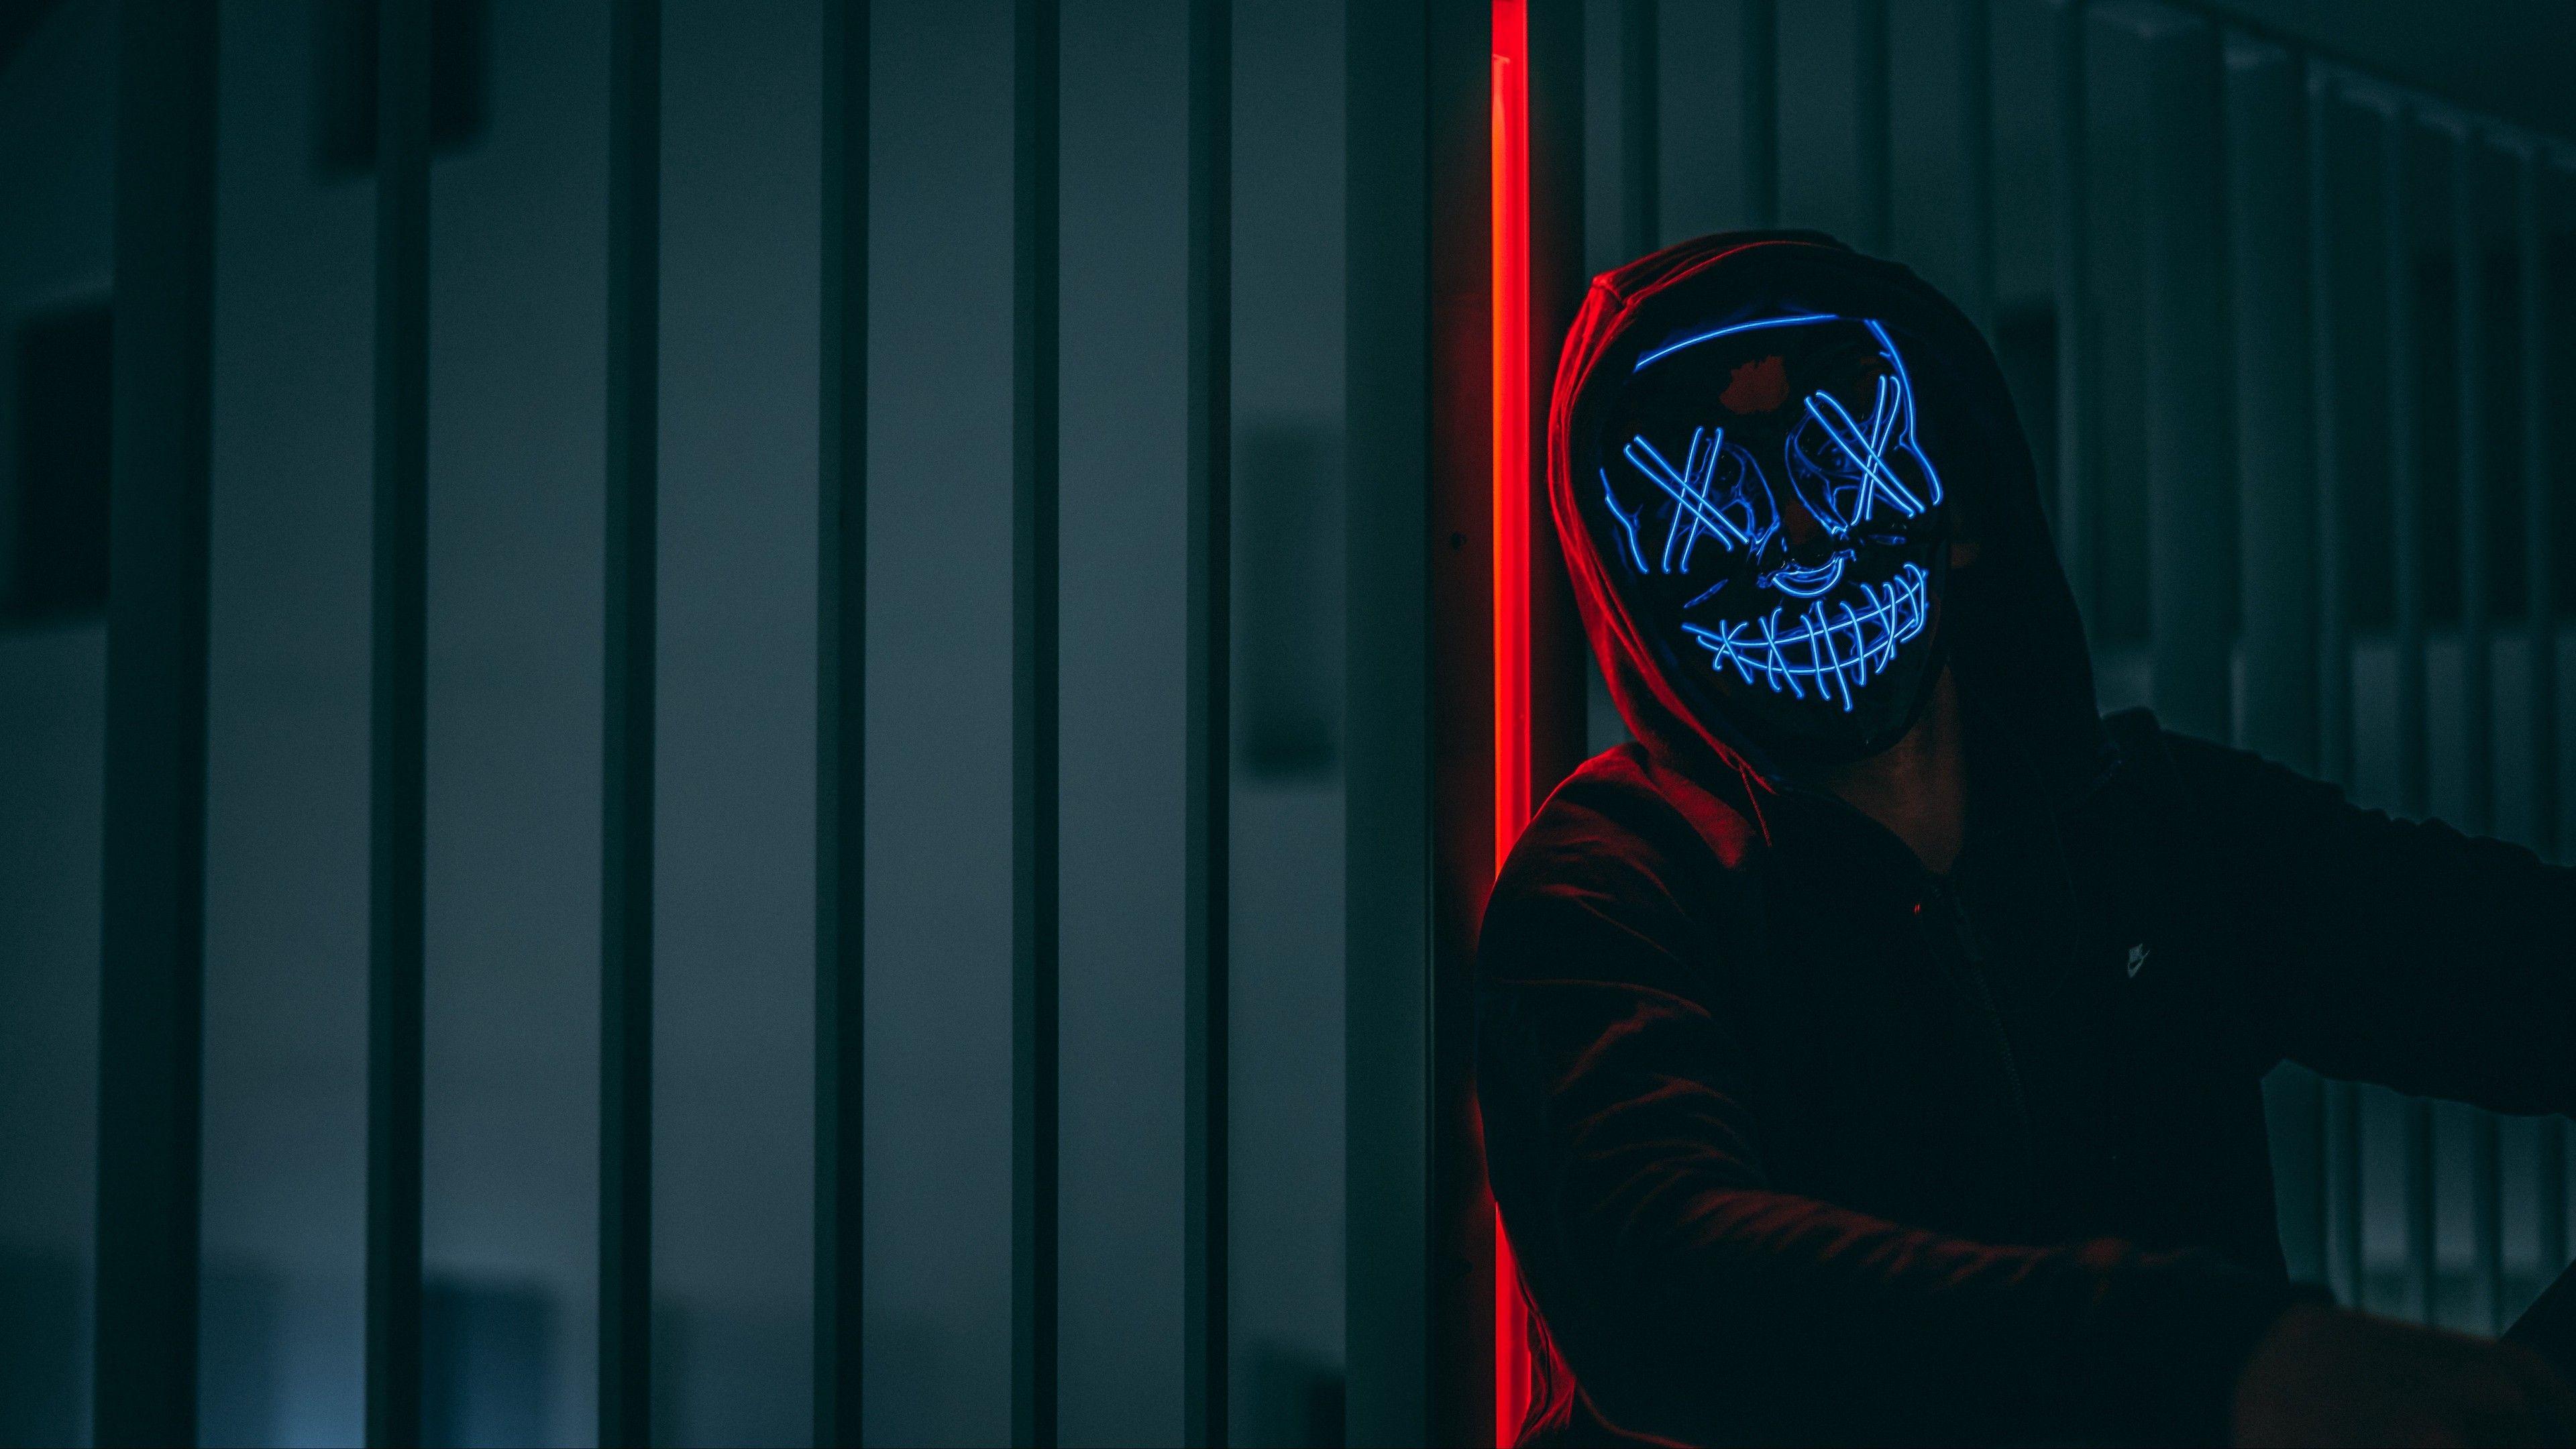 Neon Wallpapers On Wallpaperdog